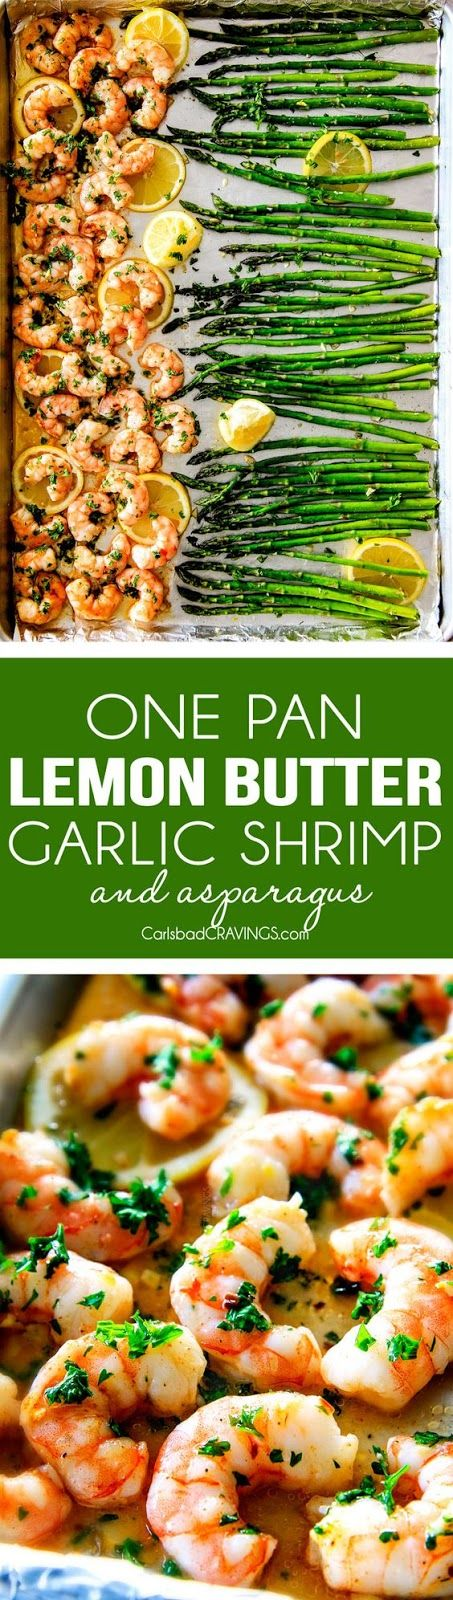 Roasted Lemon Butter Garlic Shrimp and Asparagus | Food And Cake Recipes